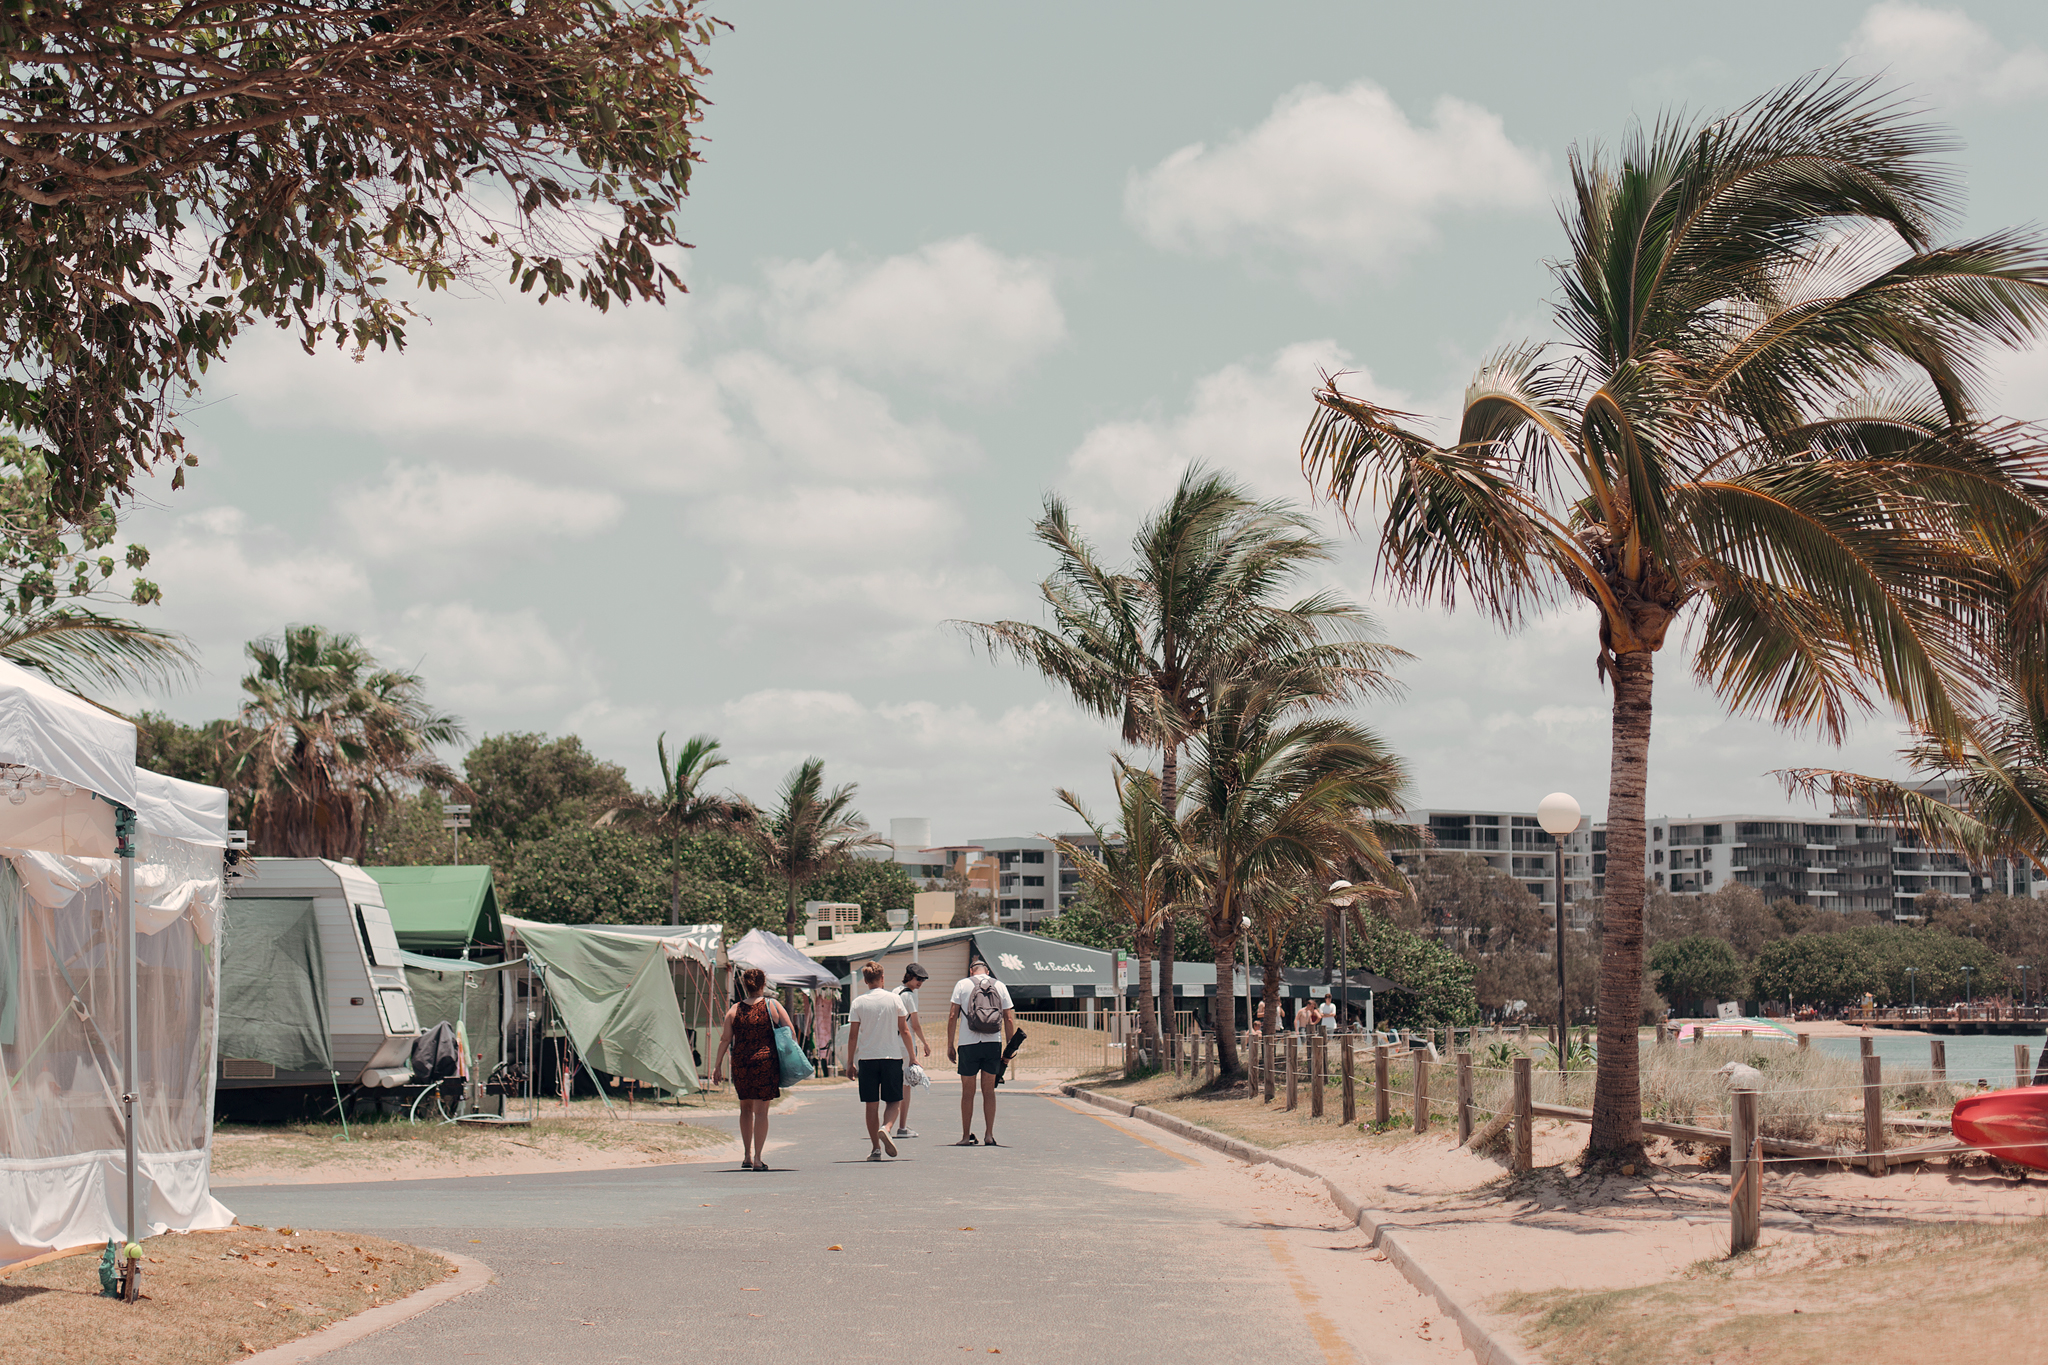 Resedagbok Sunshine Coast: Cotton Tree Beach